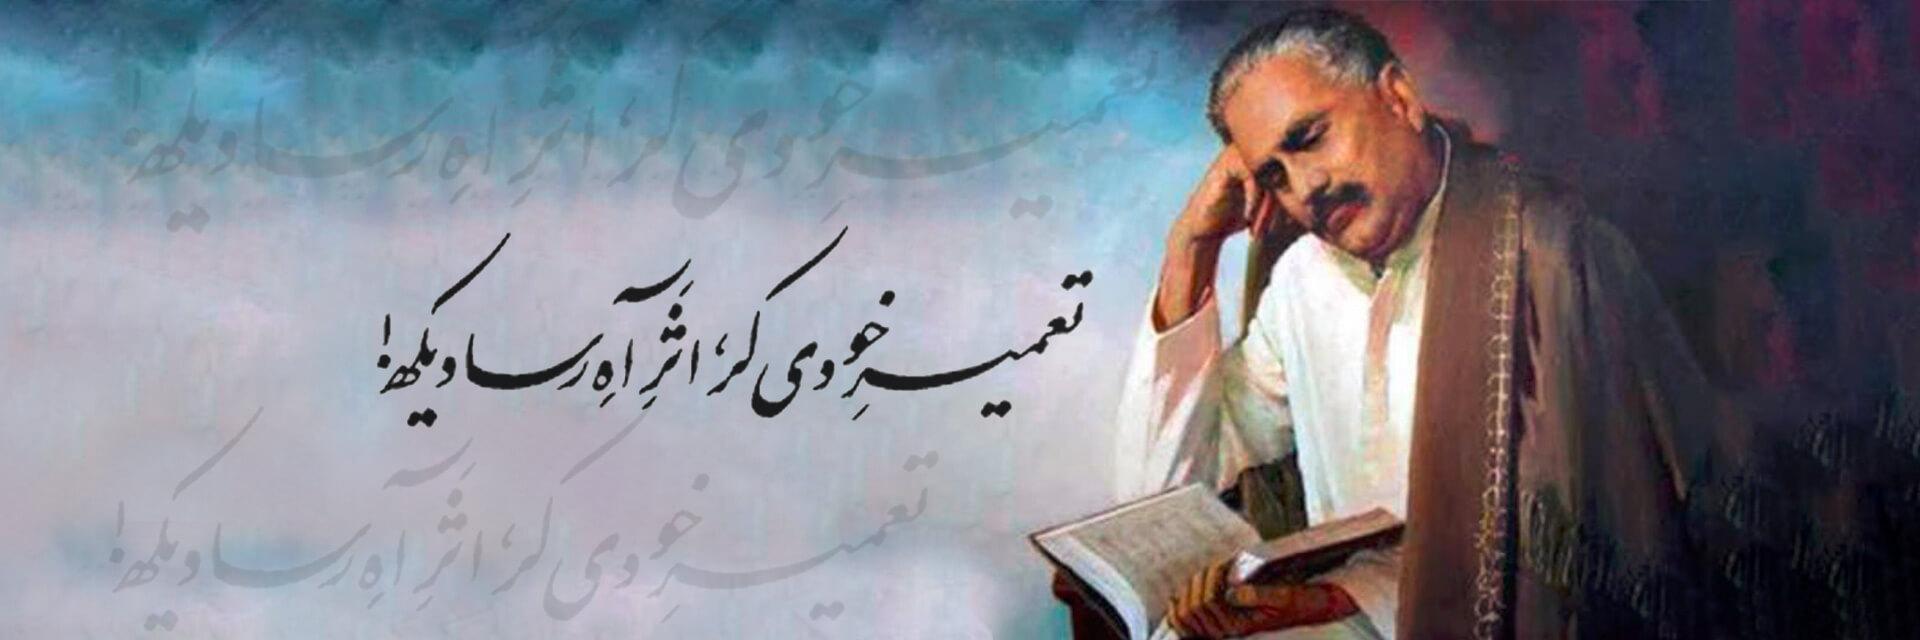 Tameer-e-Khudi